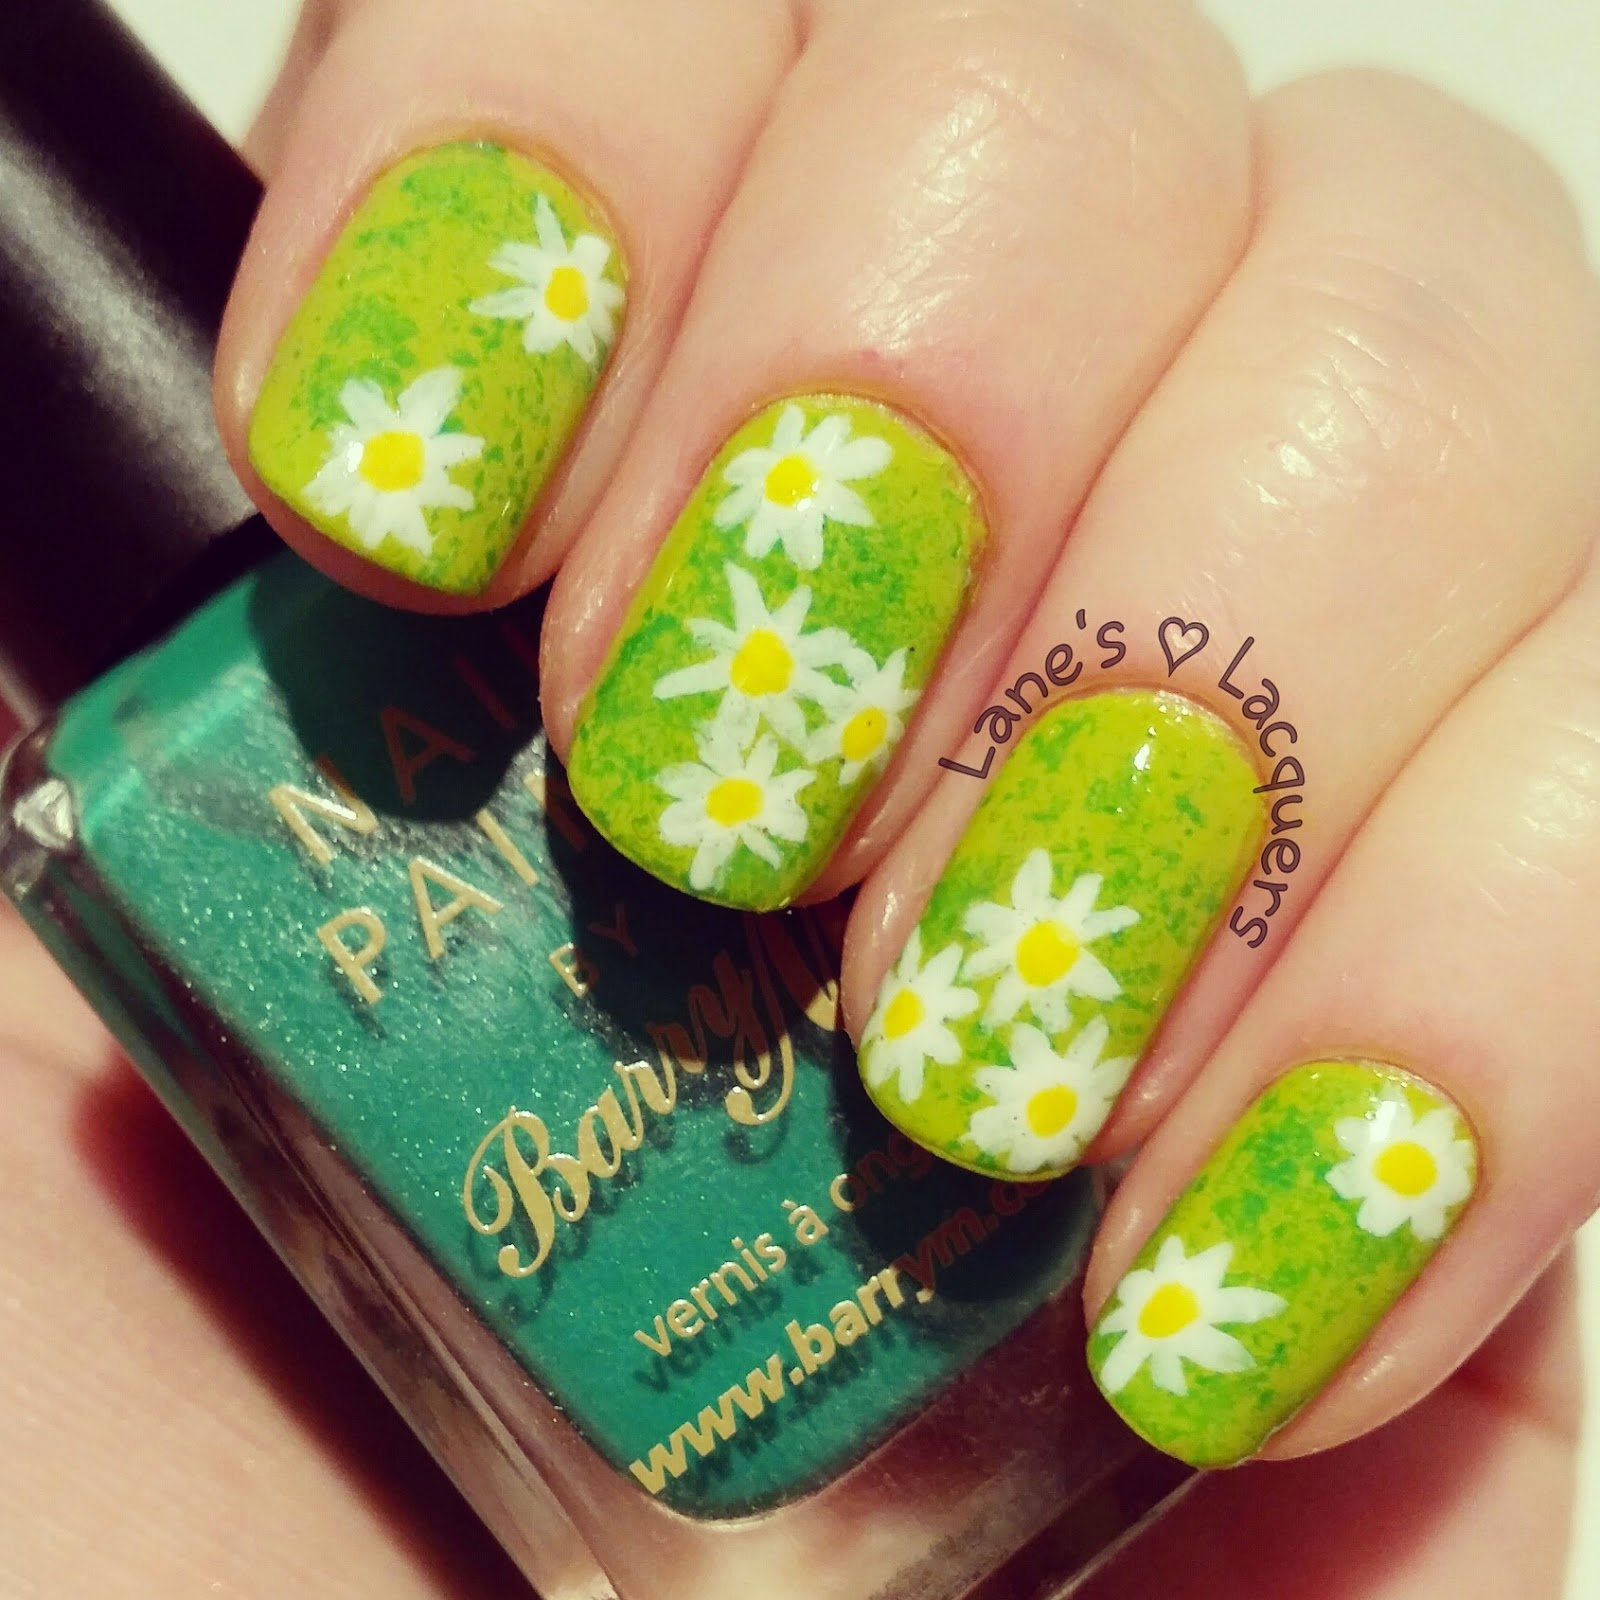 sponged-green-grass-daisies-nail-art (2)